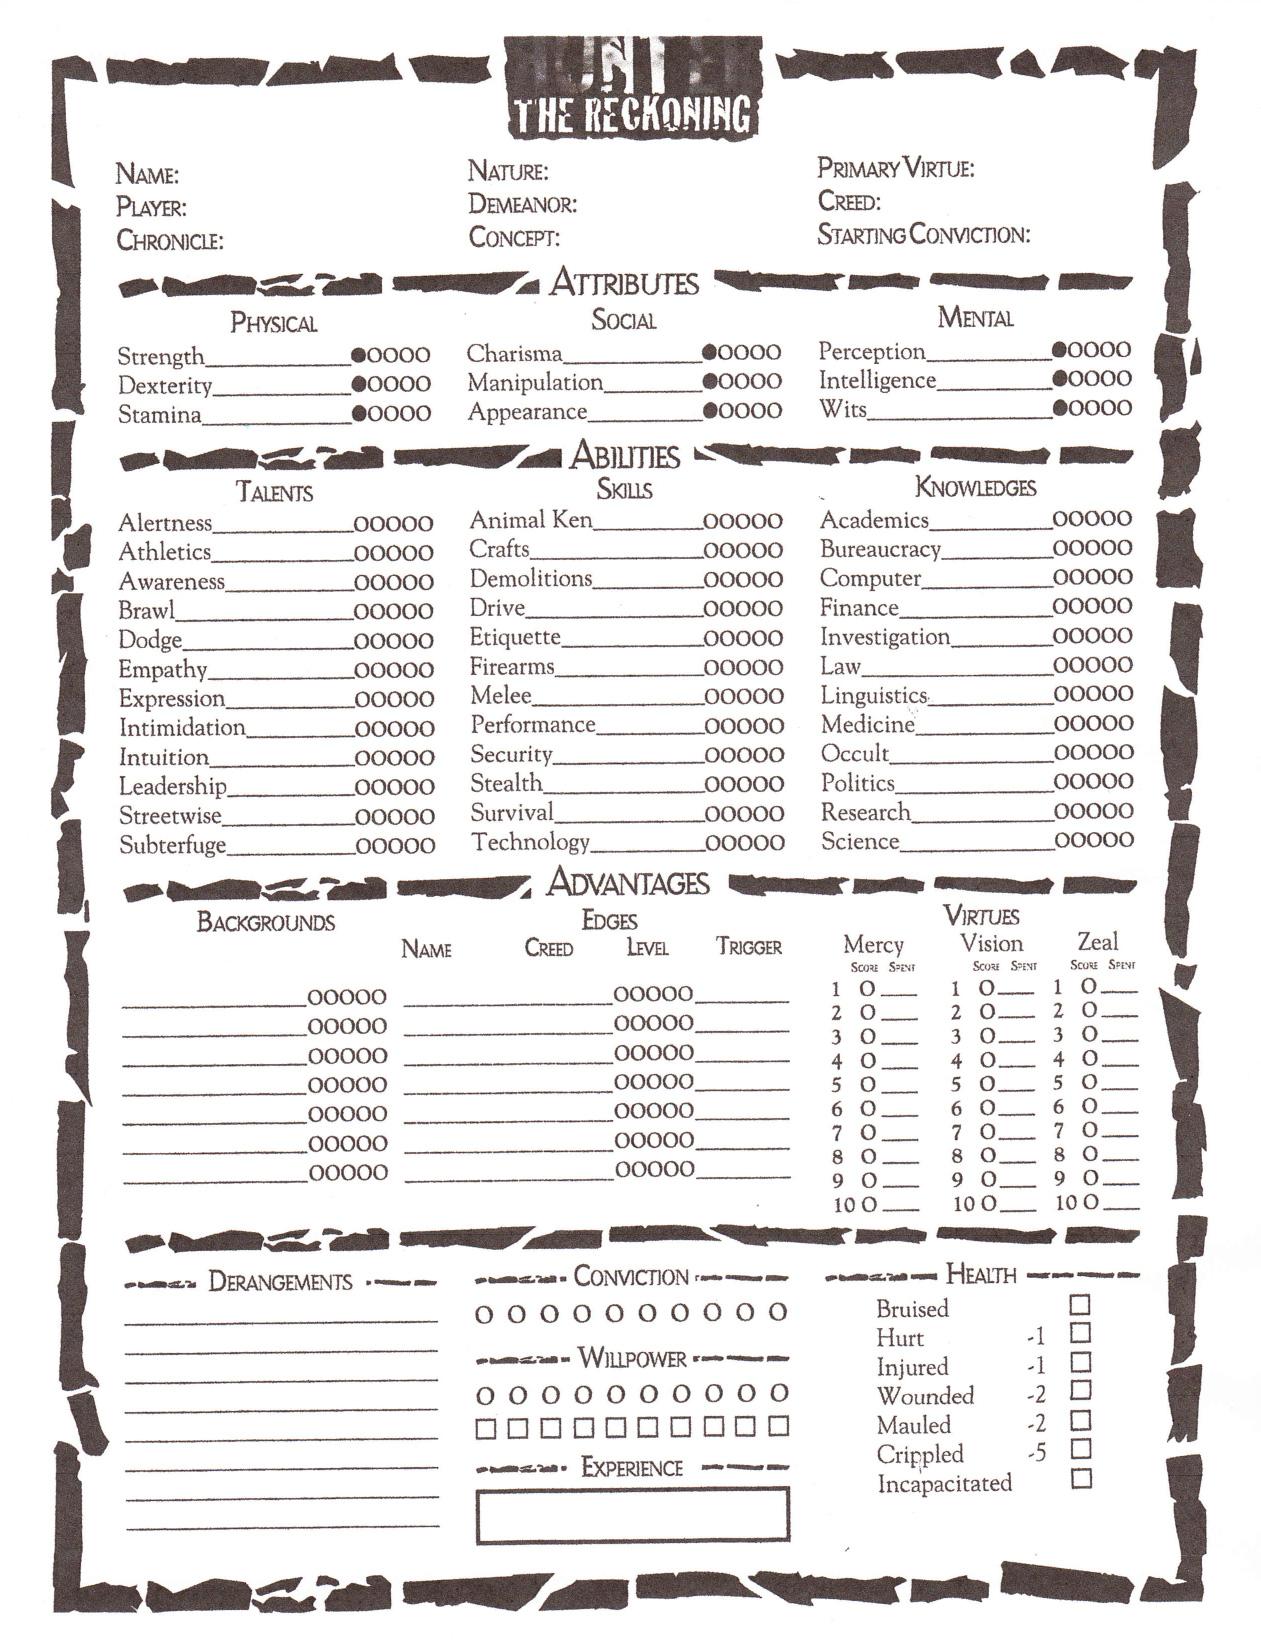 hunter-character-sheet